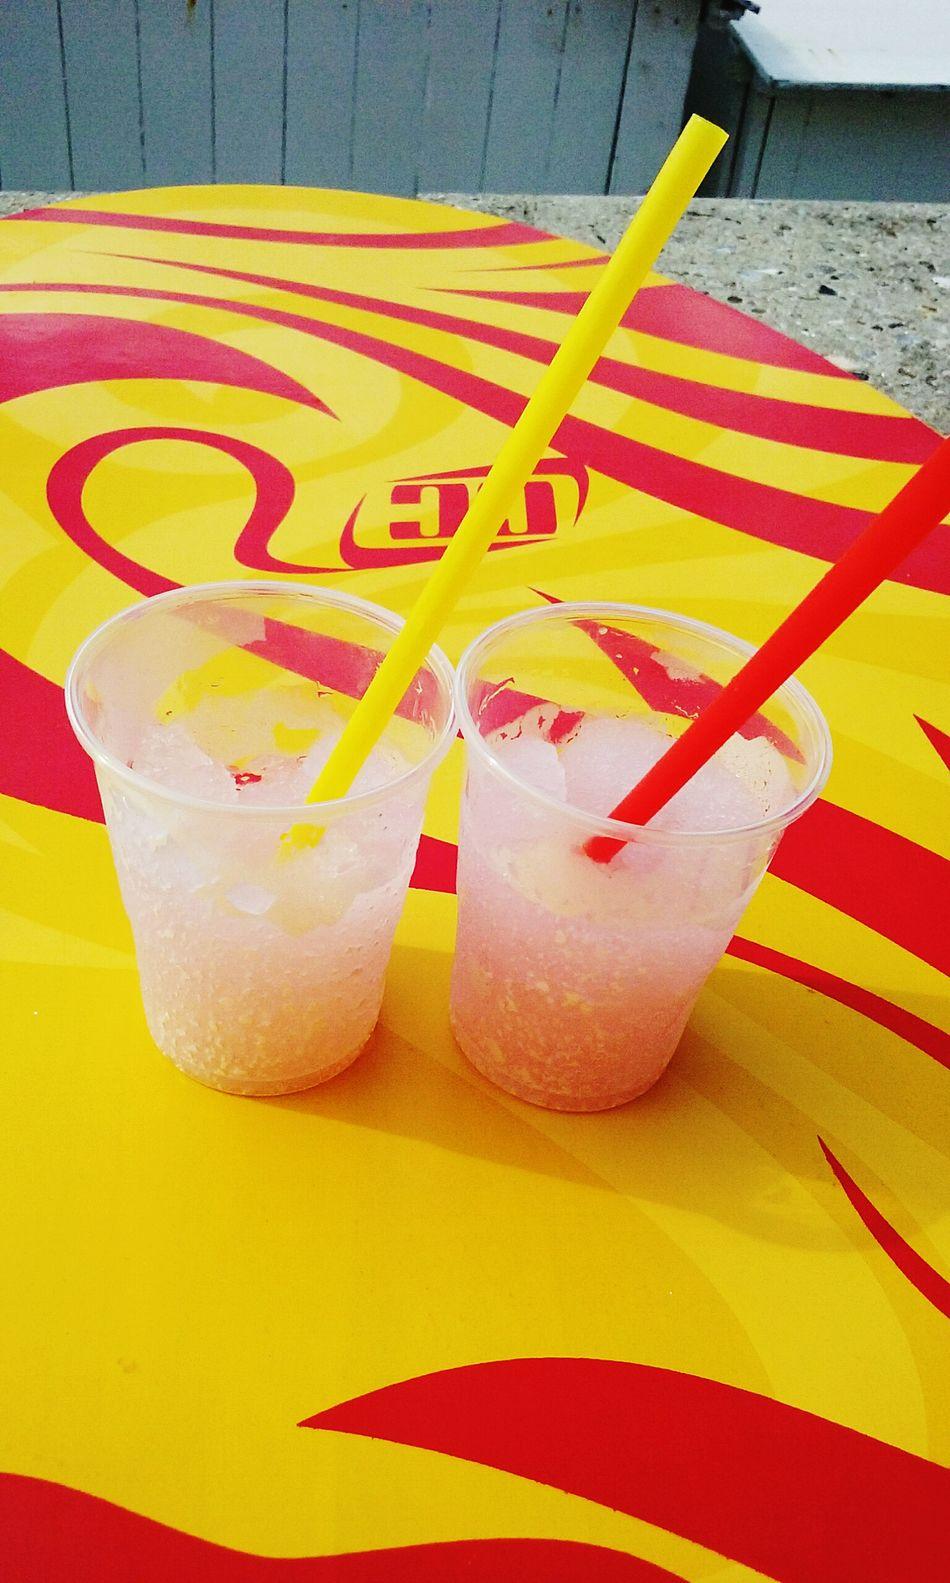 Playa Glaces Granita Amis  Amies Friends Skimboard Love Yellow Red